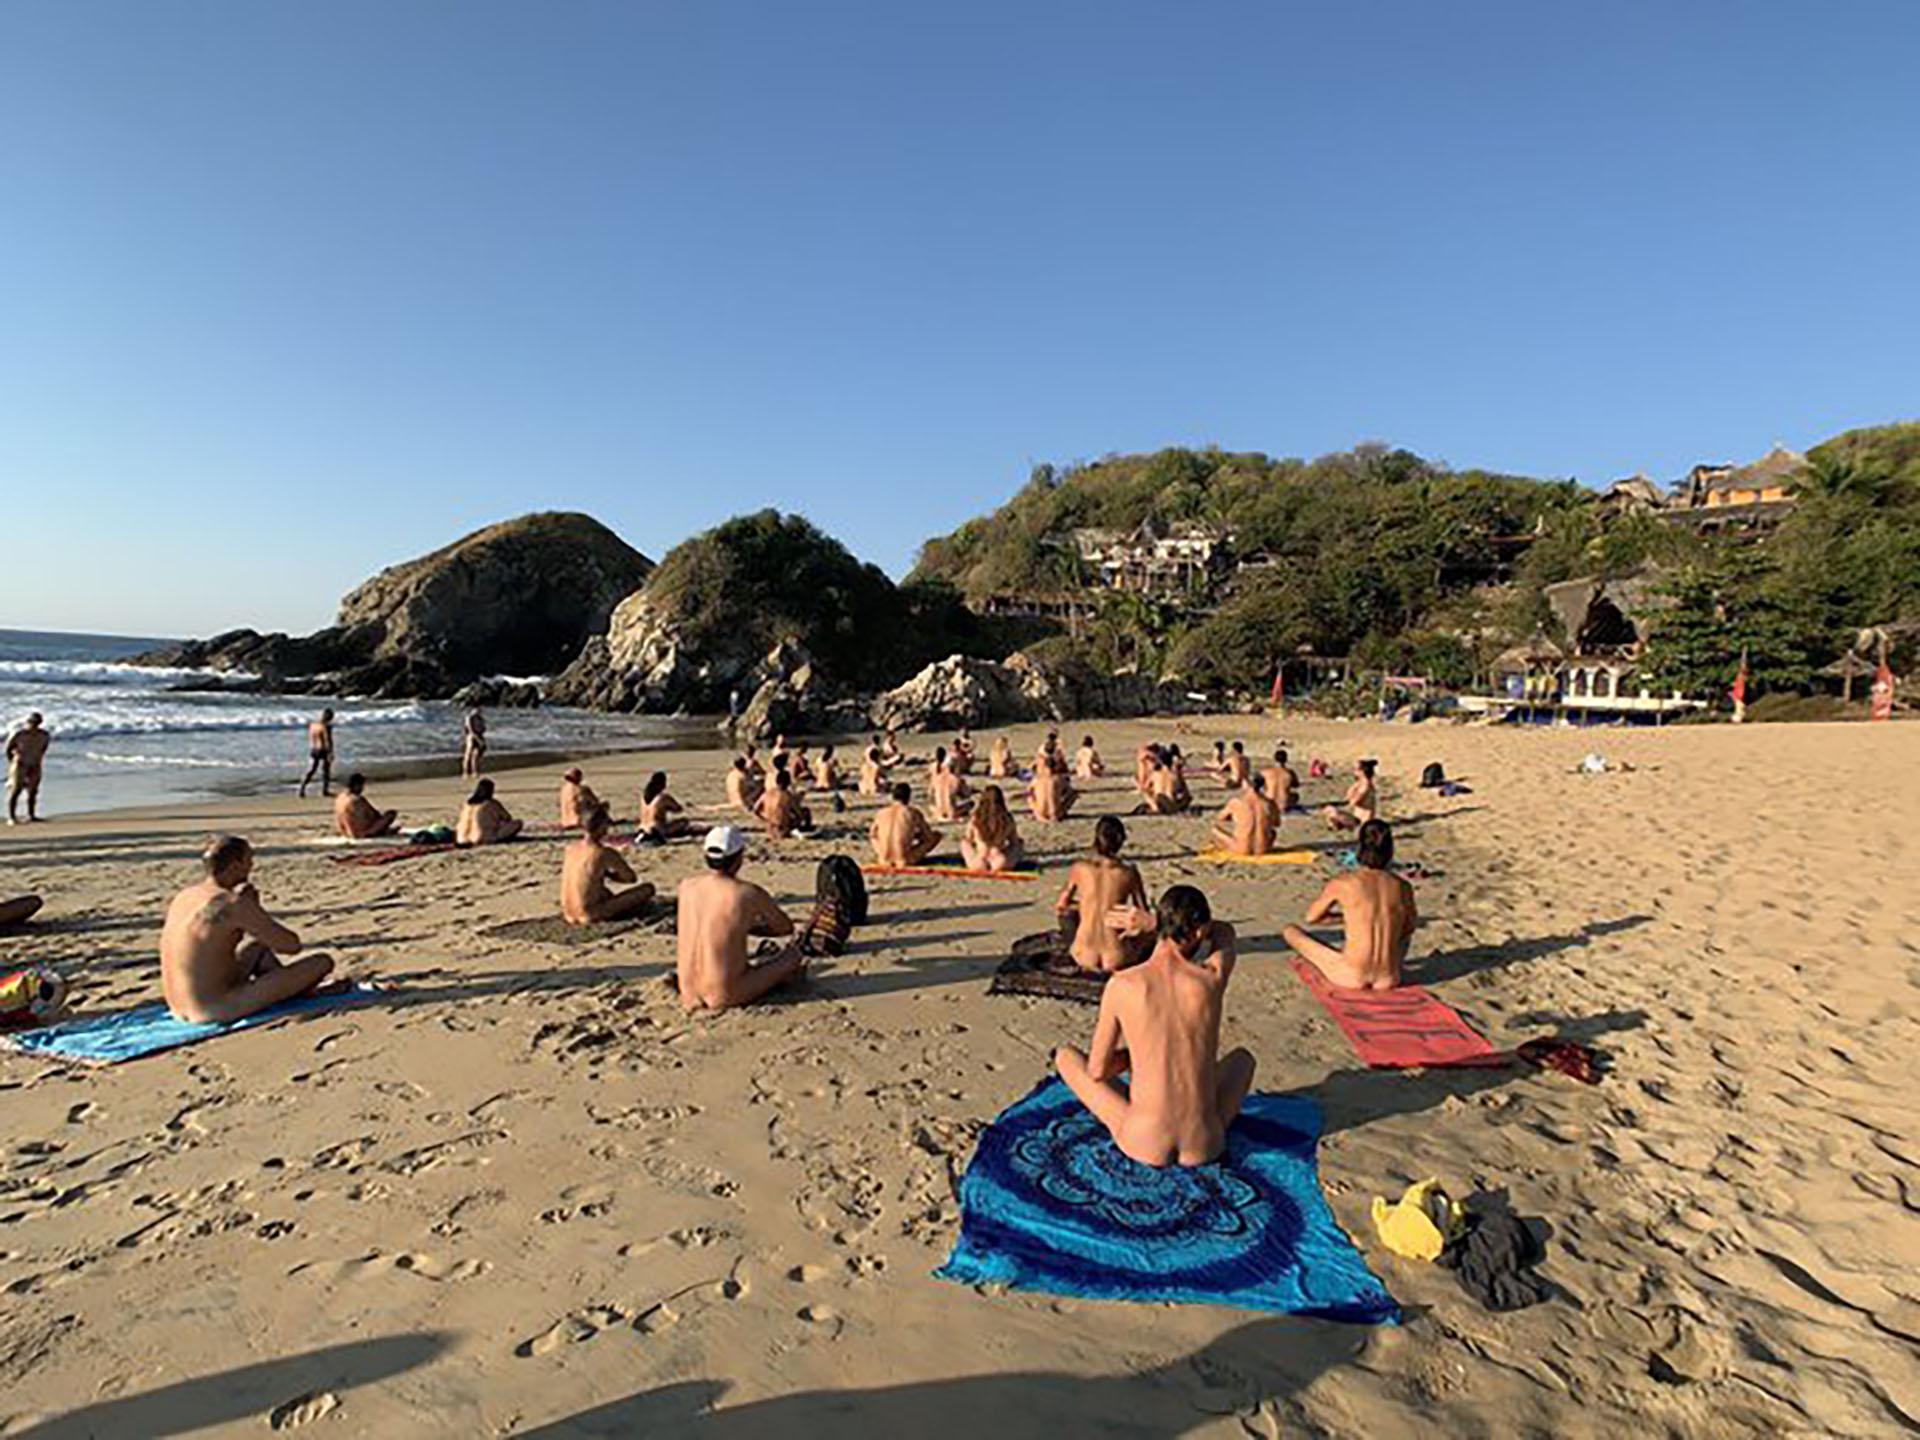 Modelo argentina foto mujer desnuda playa nudista 25